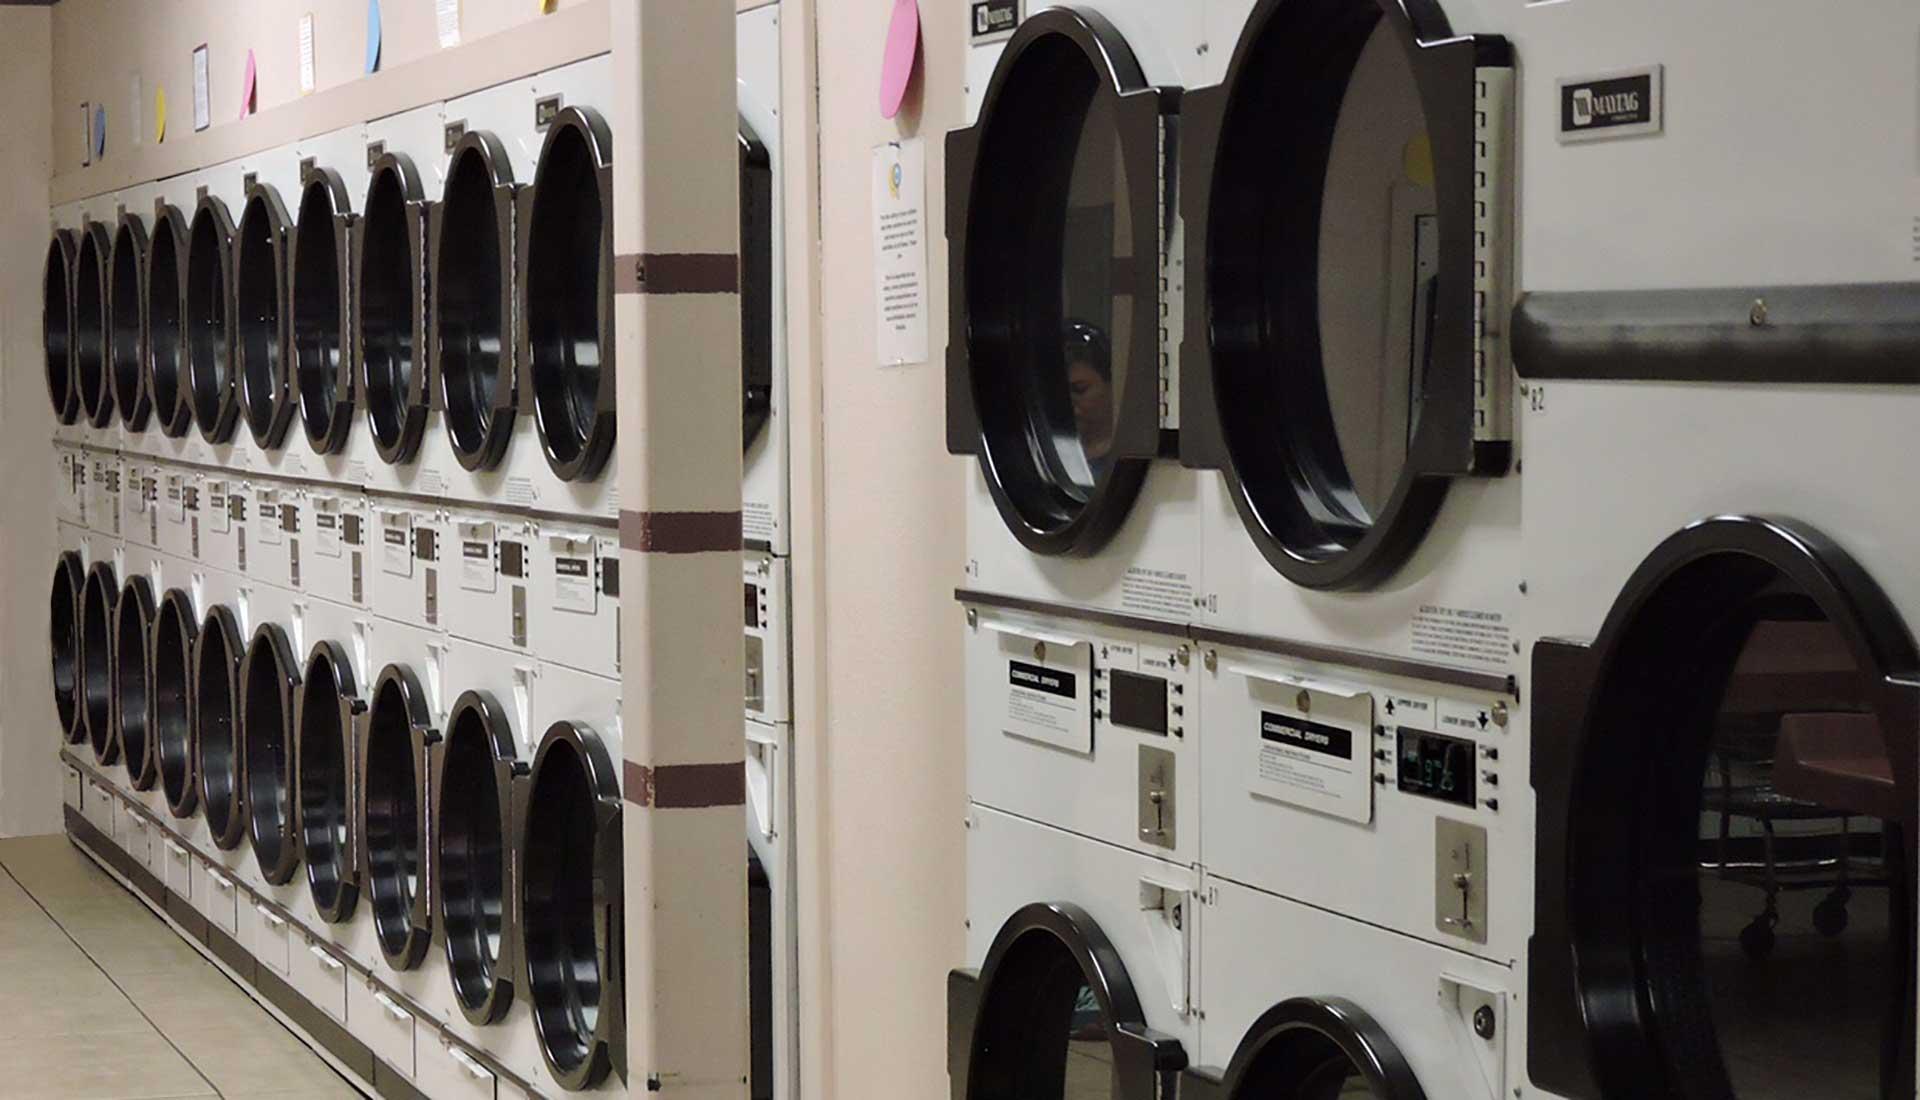 Home lavajet laundromat laundromat next to solutioingenieria Image collections